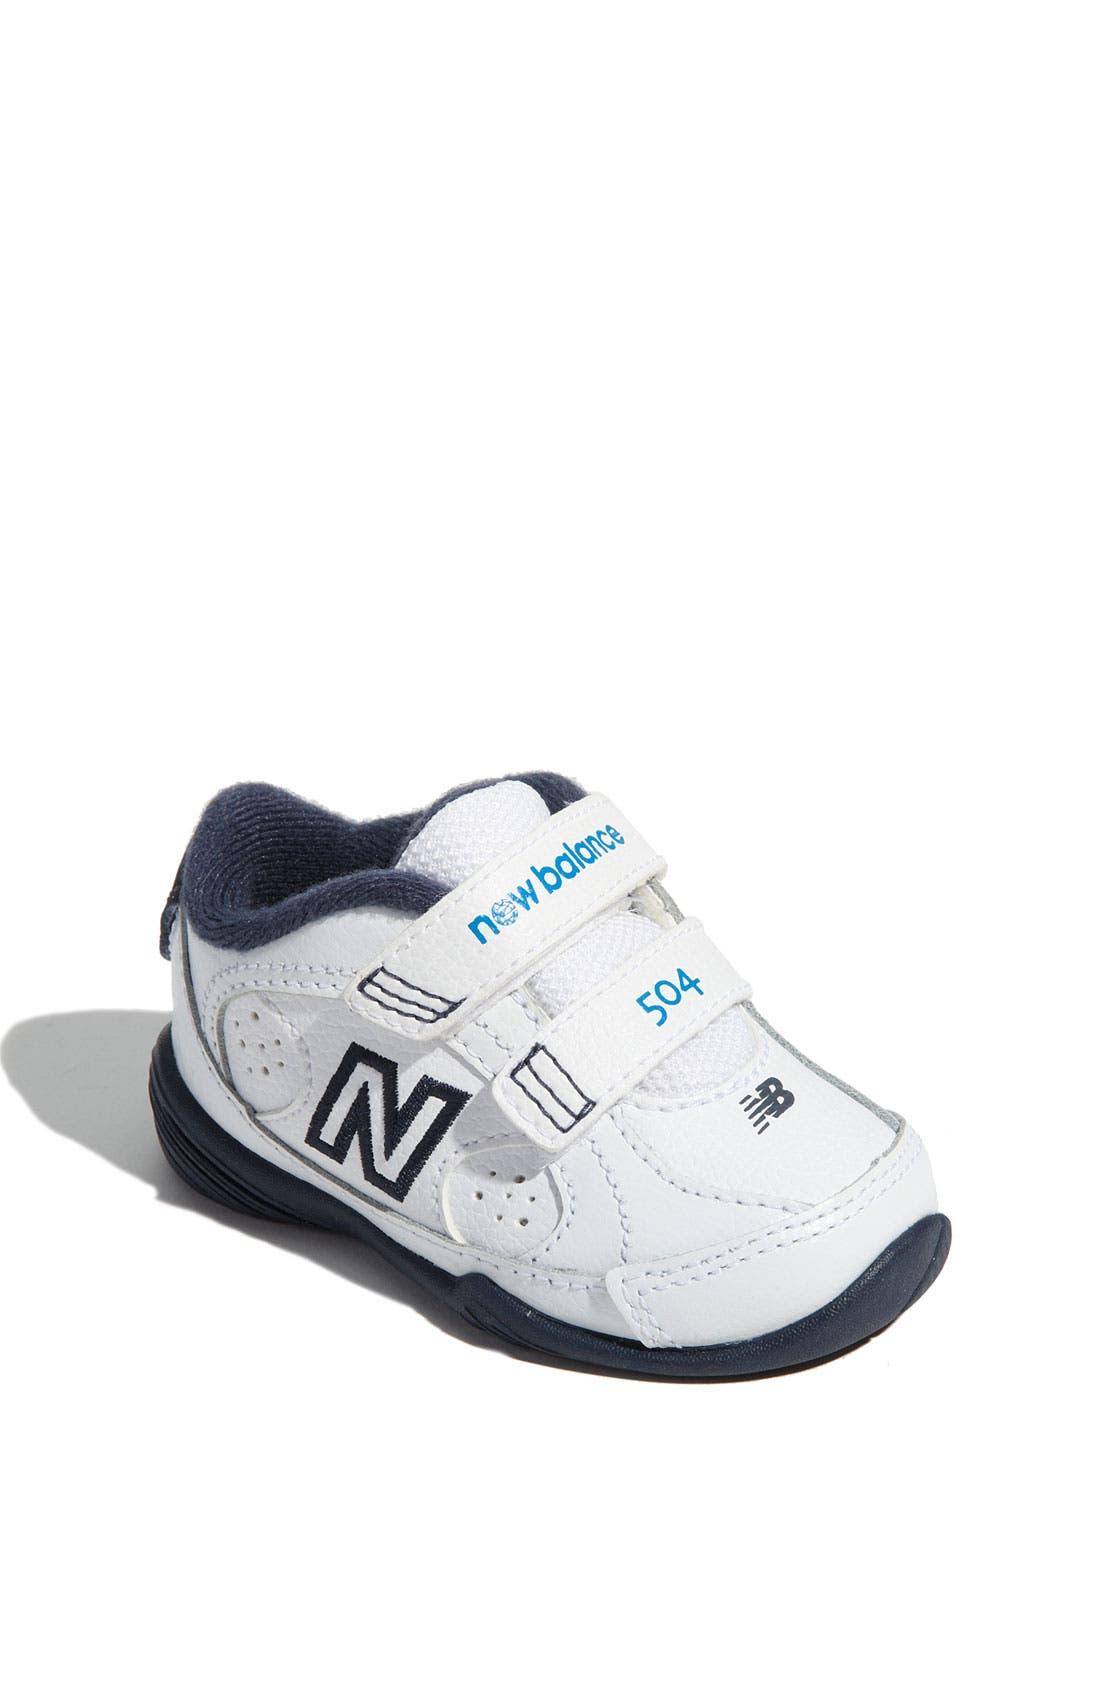 Main Image - New Balance '504' Sneaker (Baby, Walker & Toddler)